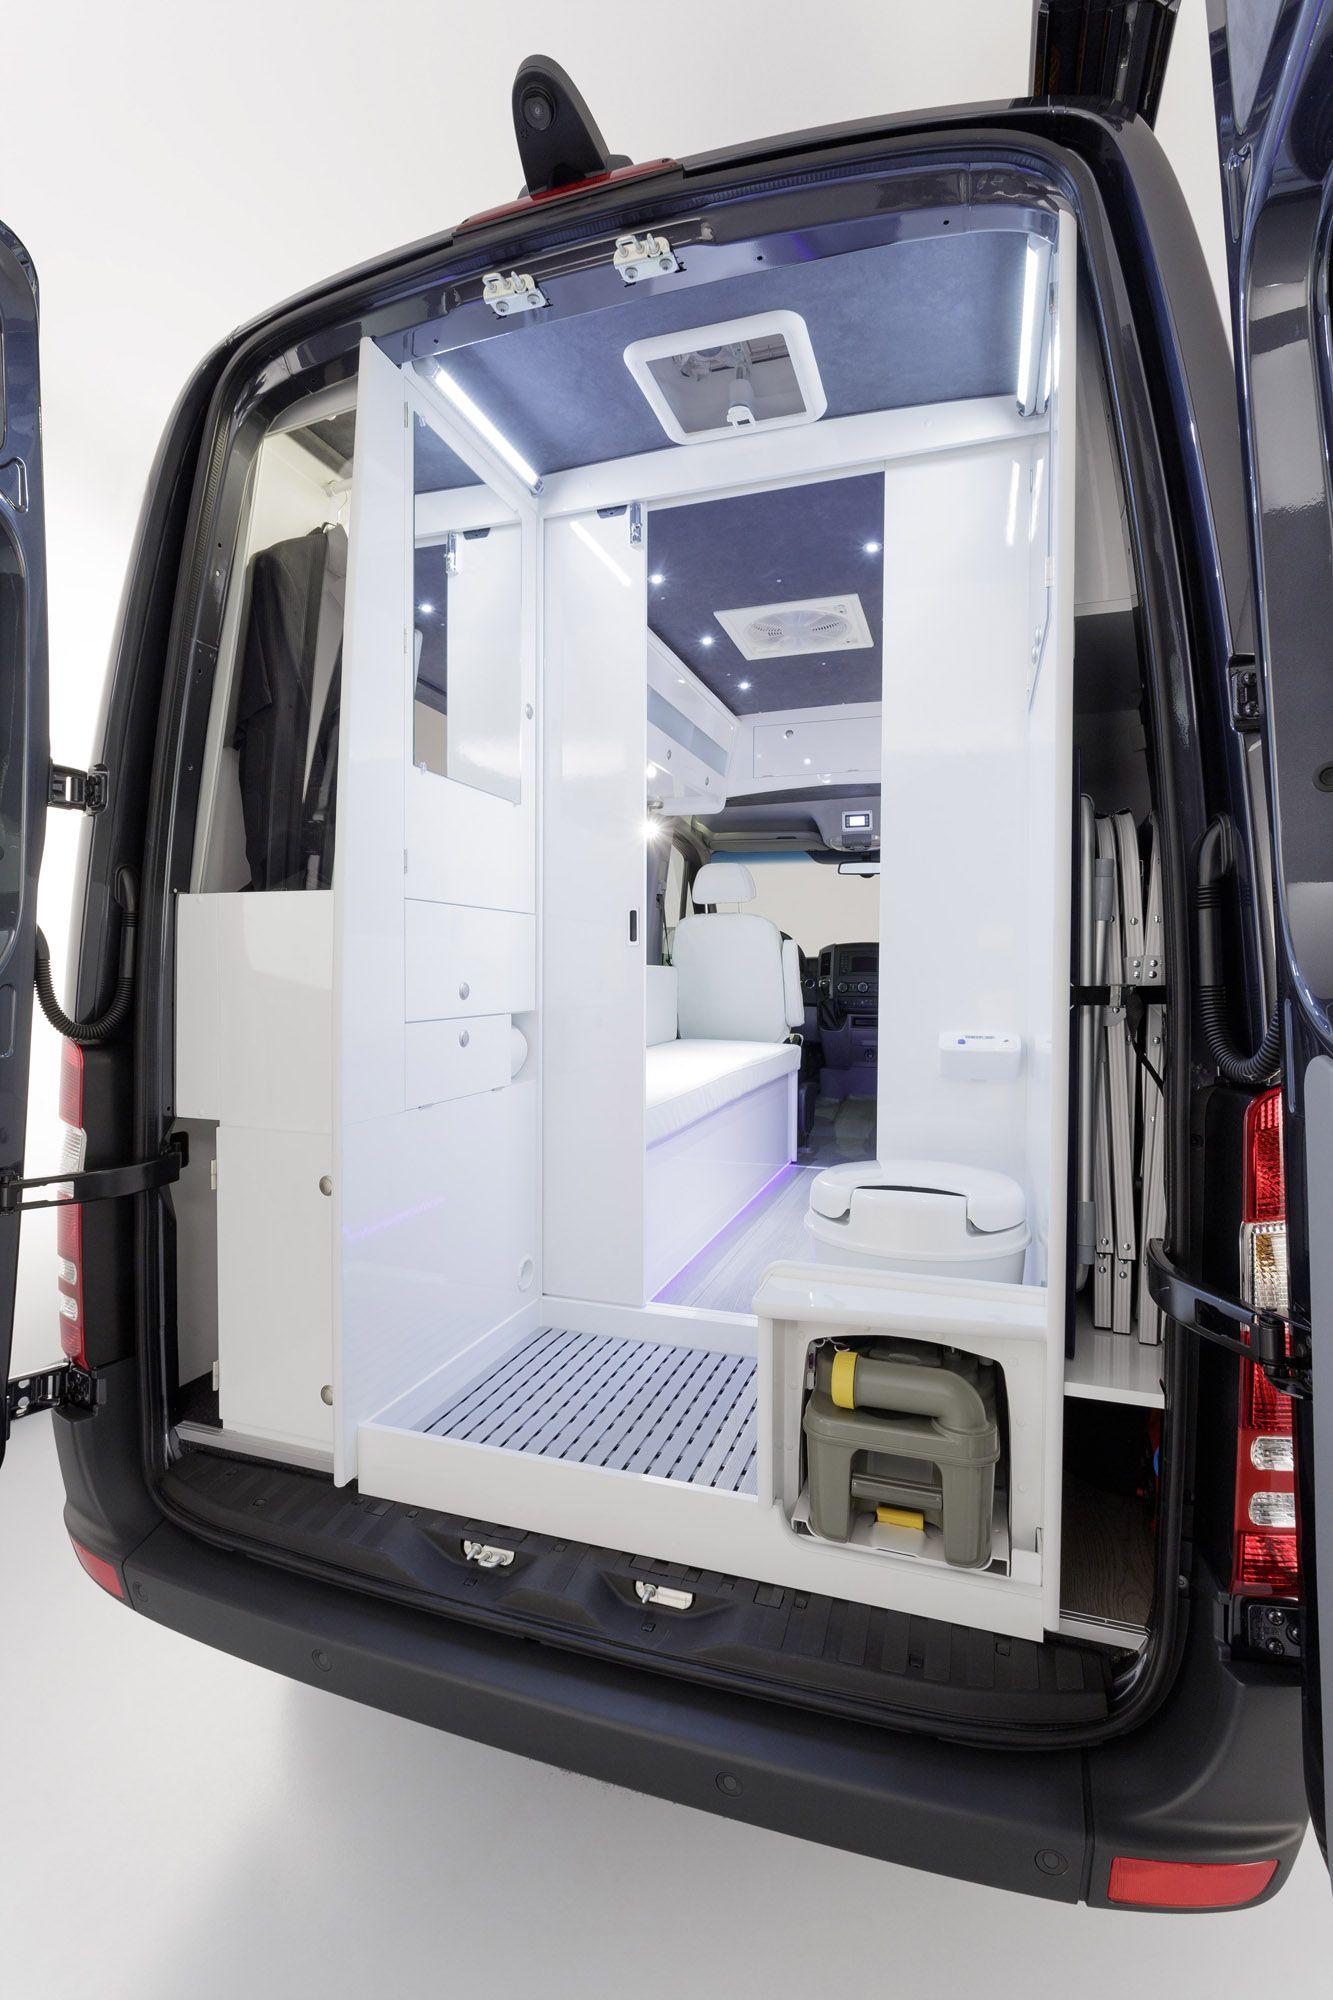 Mercedes Benz Sprinter Caravan Concept Viano Fun Viano Marco